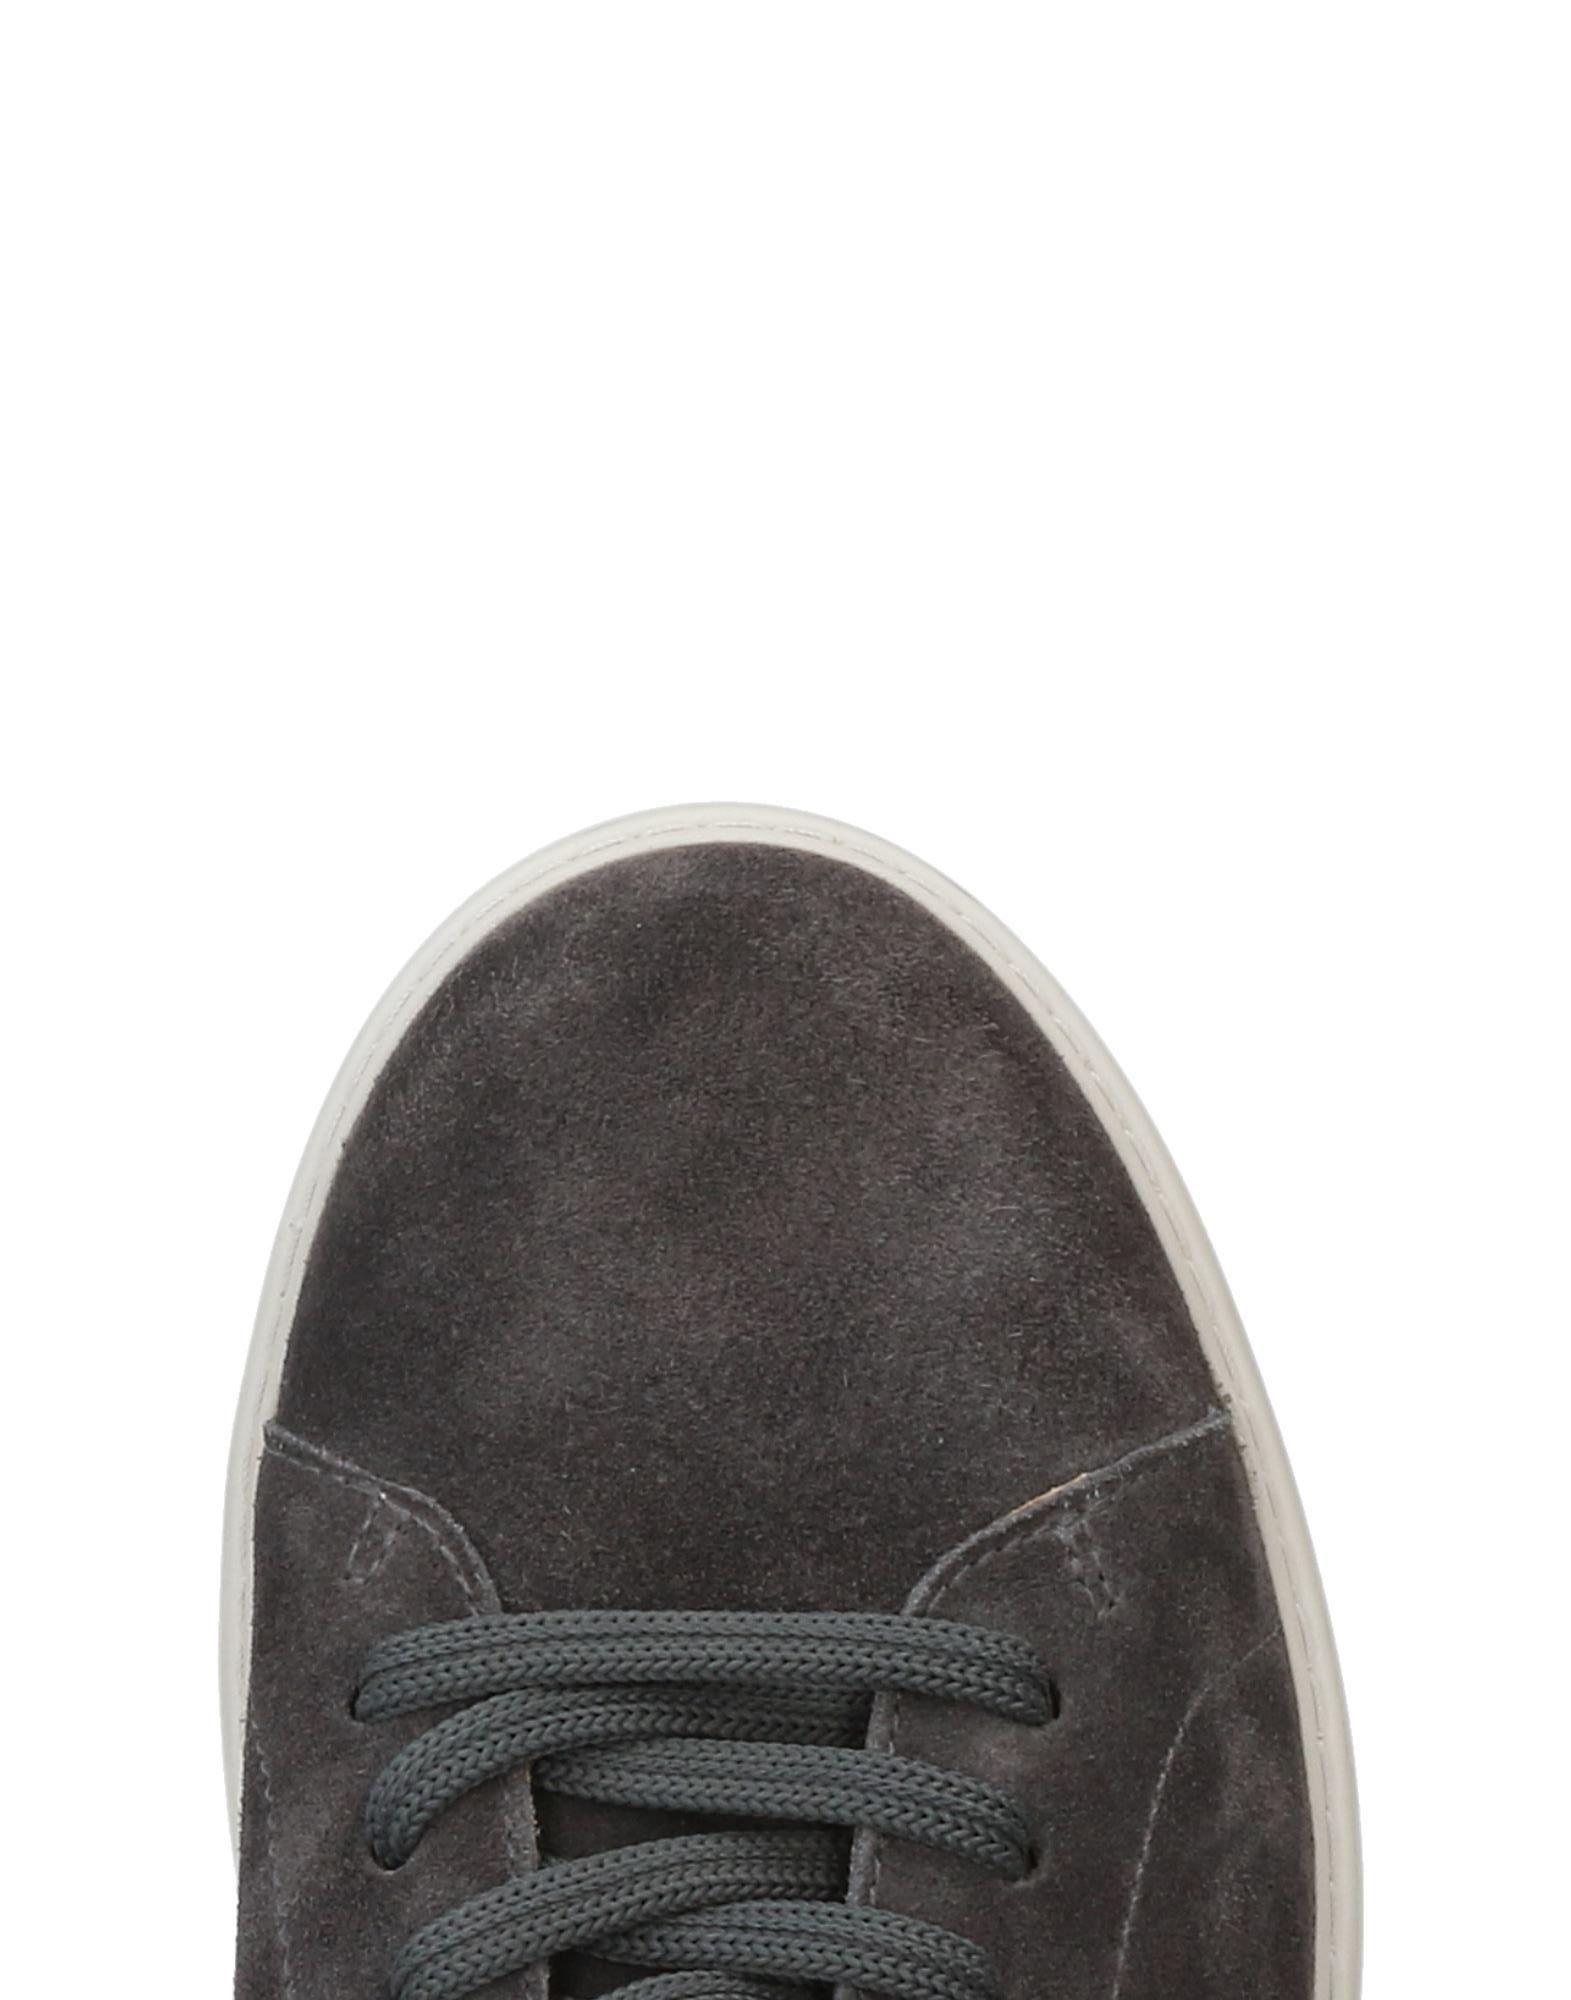 Salvatore Ferragamo Sneakers Qualität Herren  11435392KV Gute Qualität Sneakers beliebte Schuhe 56e0a0